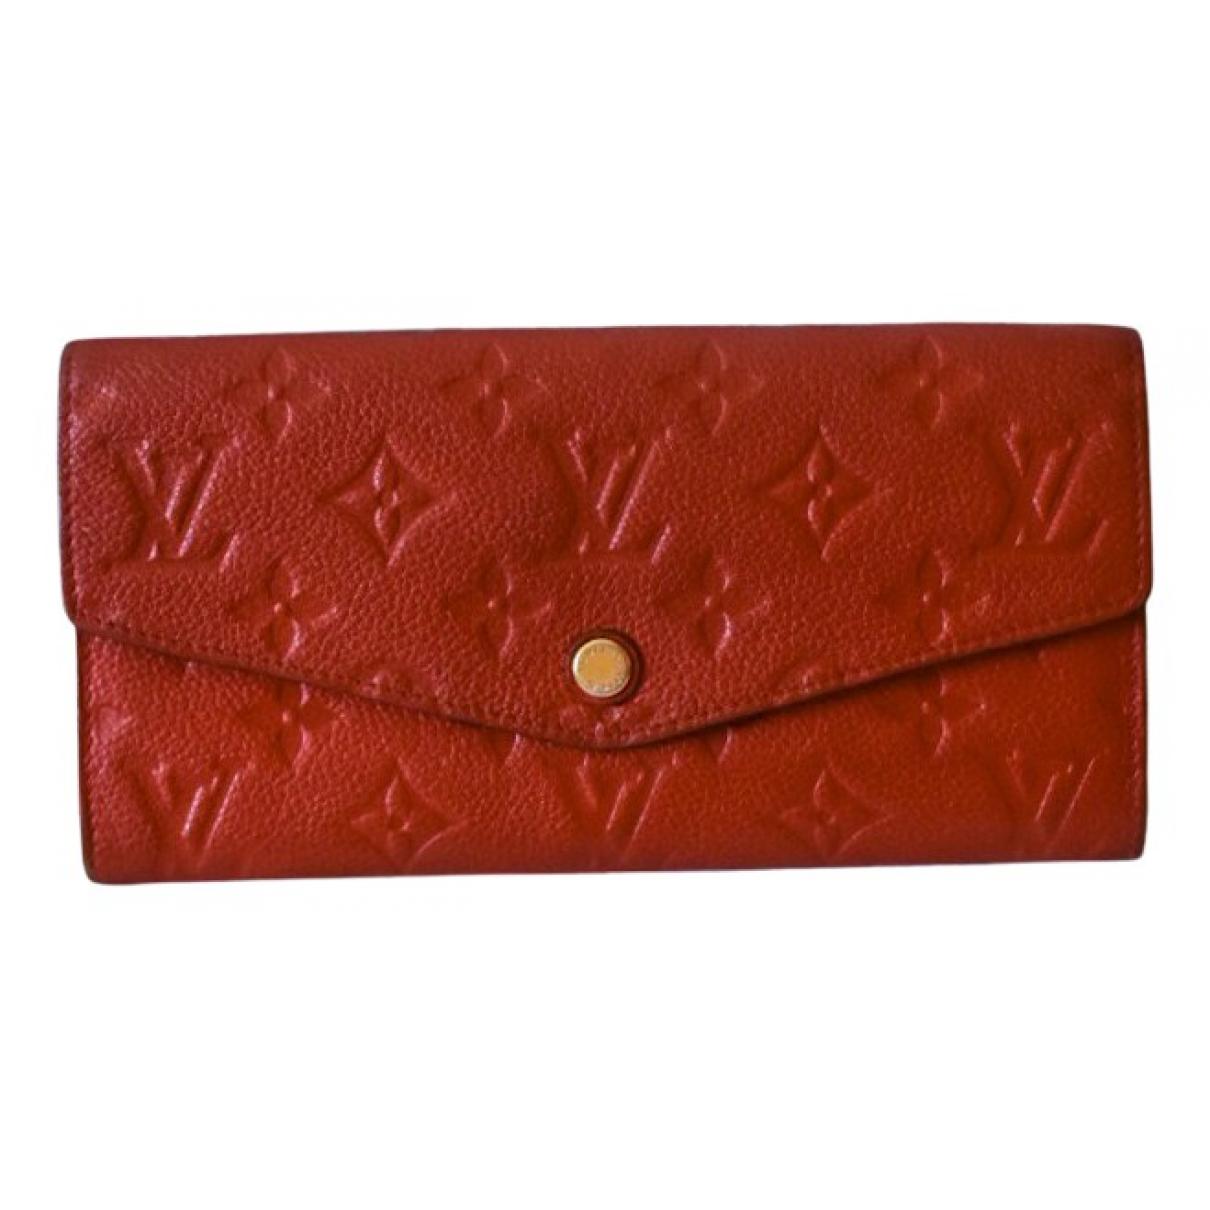 Louis Vuitton \N Portemonnaie in  Rot Leder